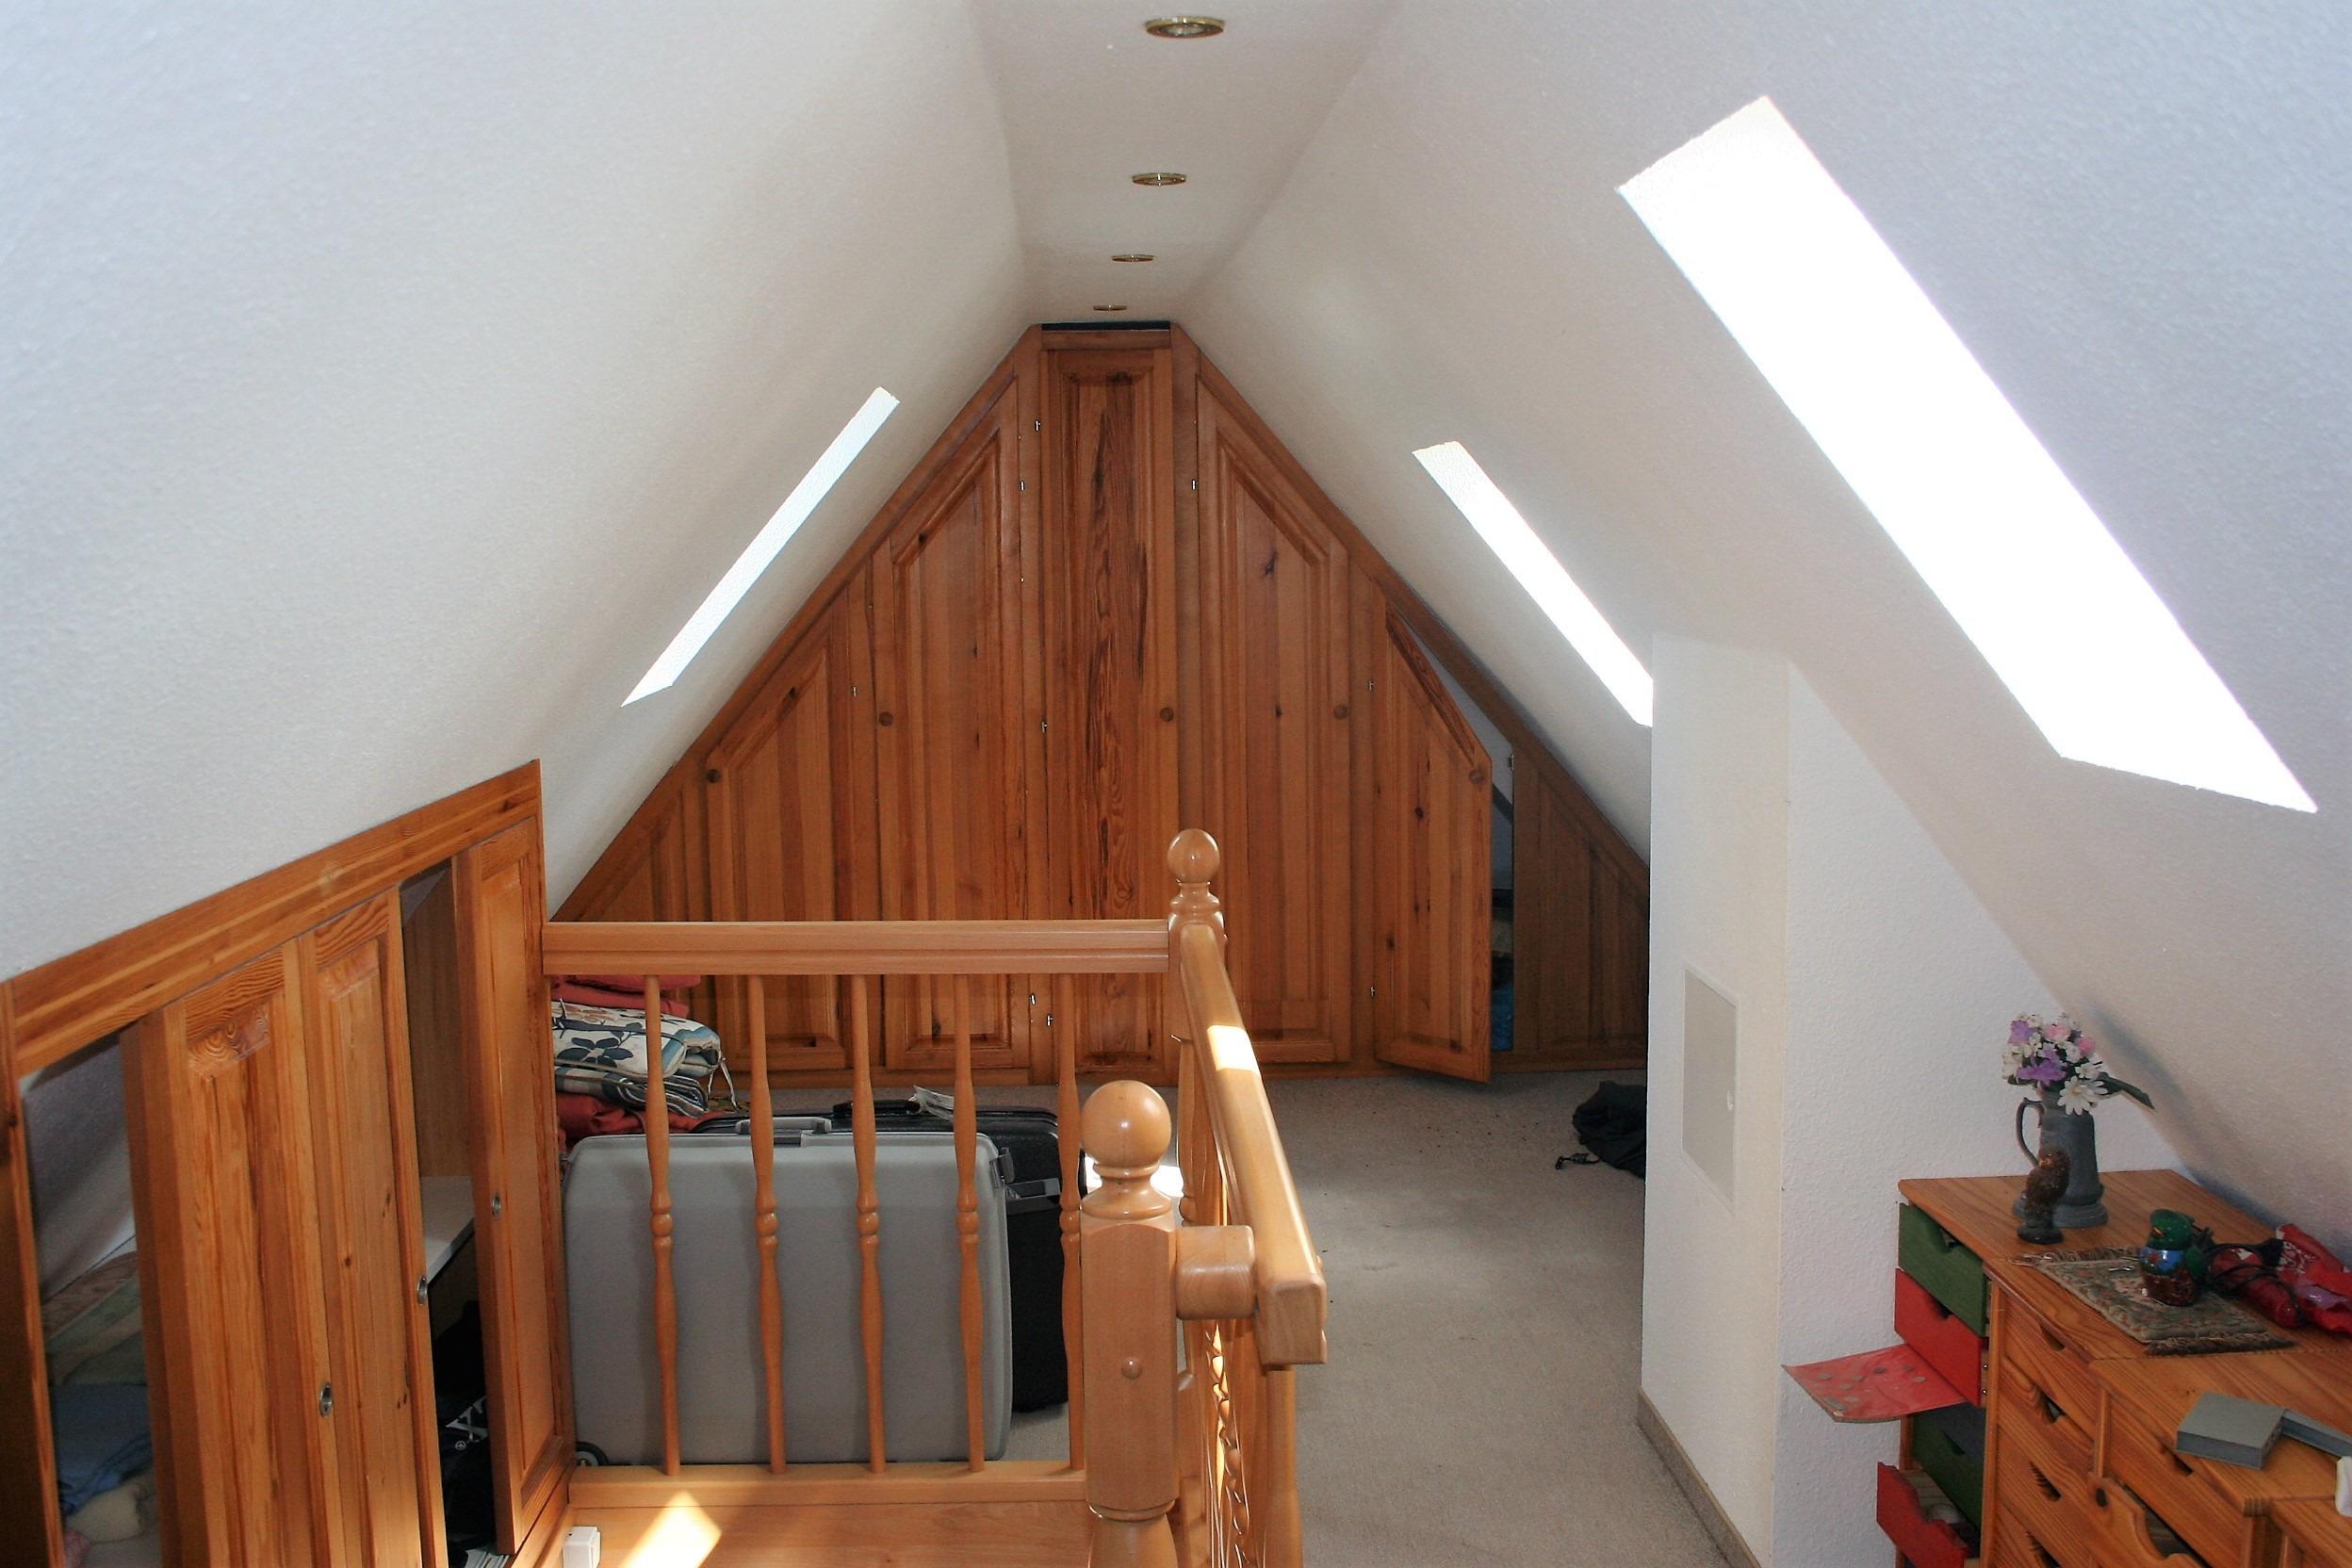 Einfamilienhaus Merseburg - ausgebautes Dachgeschoss